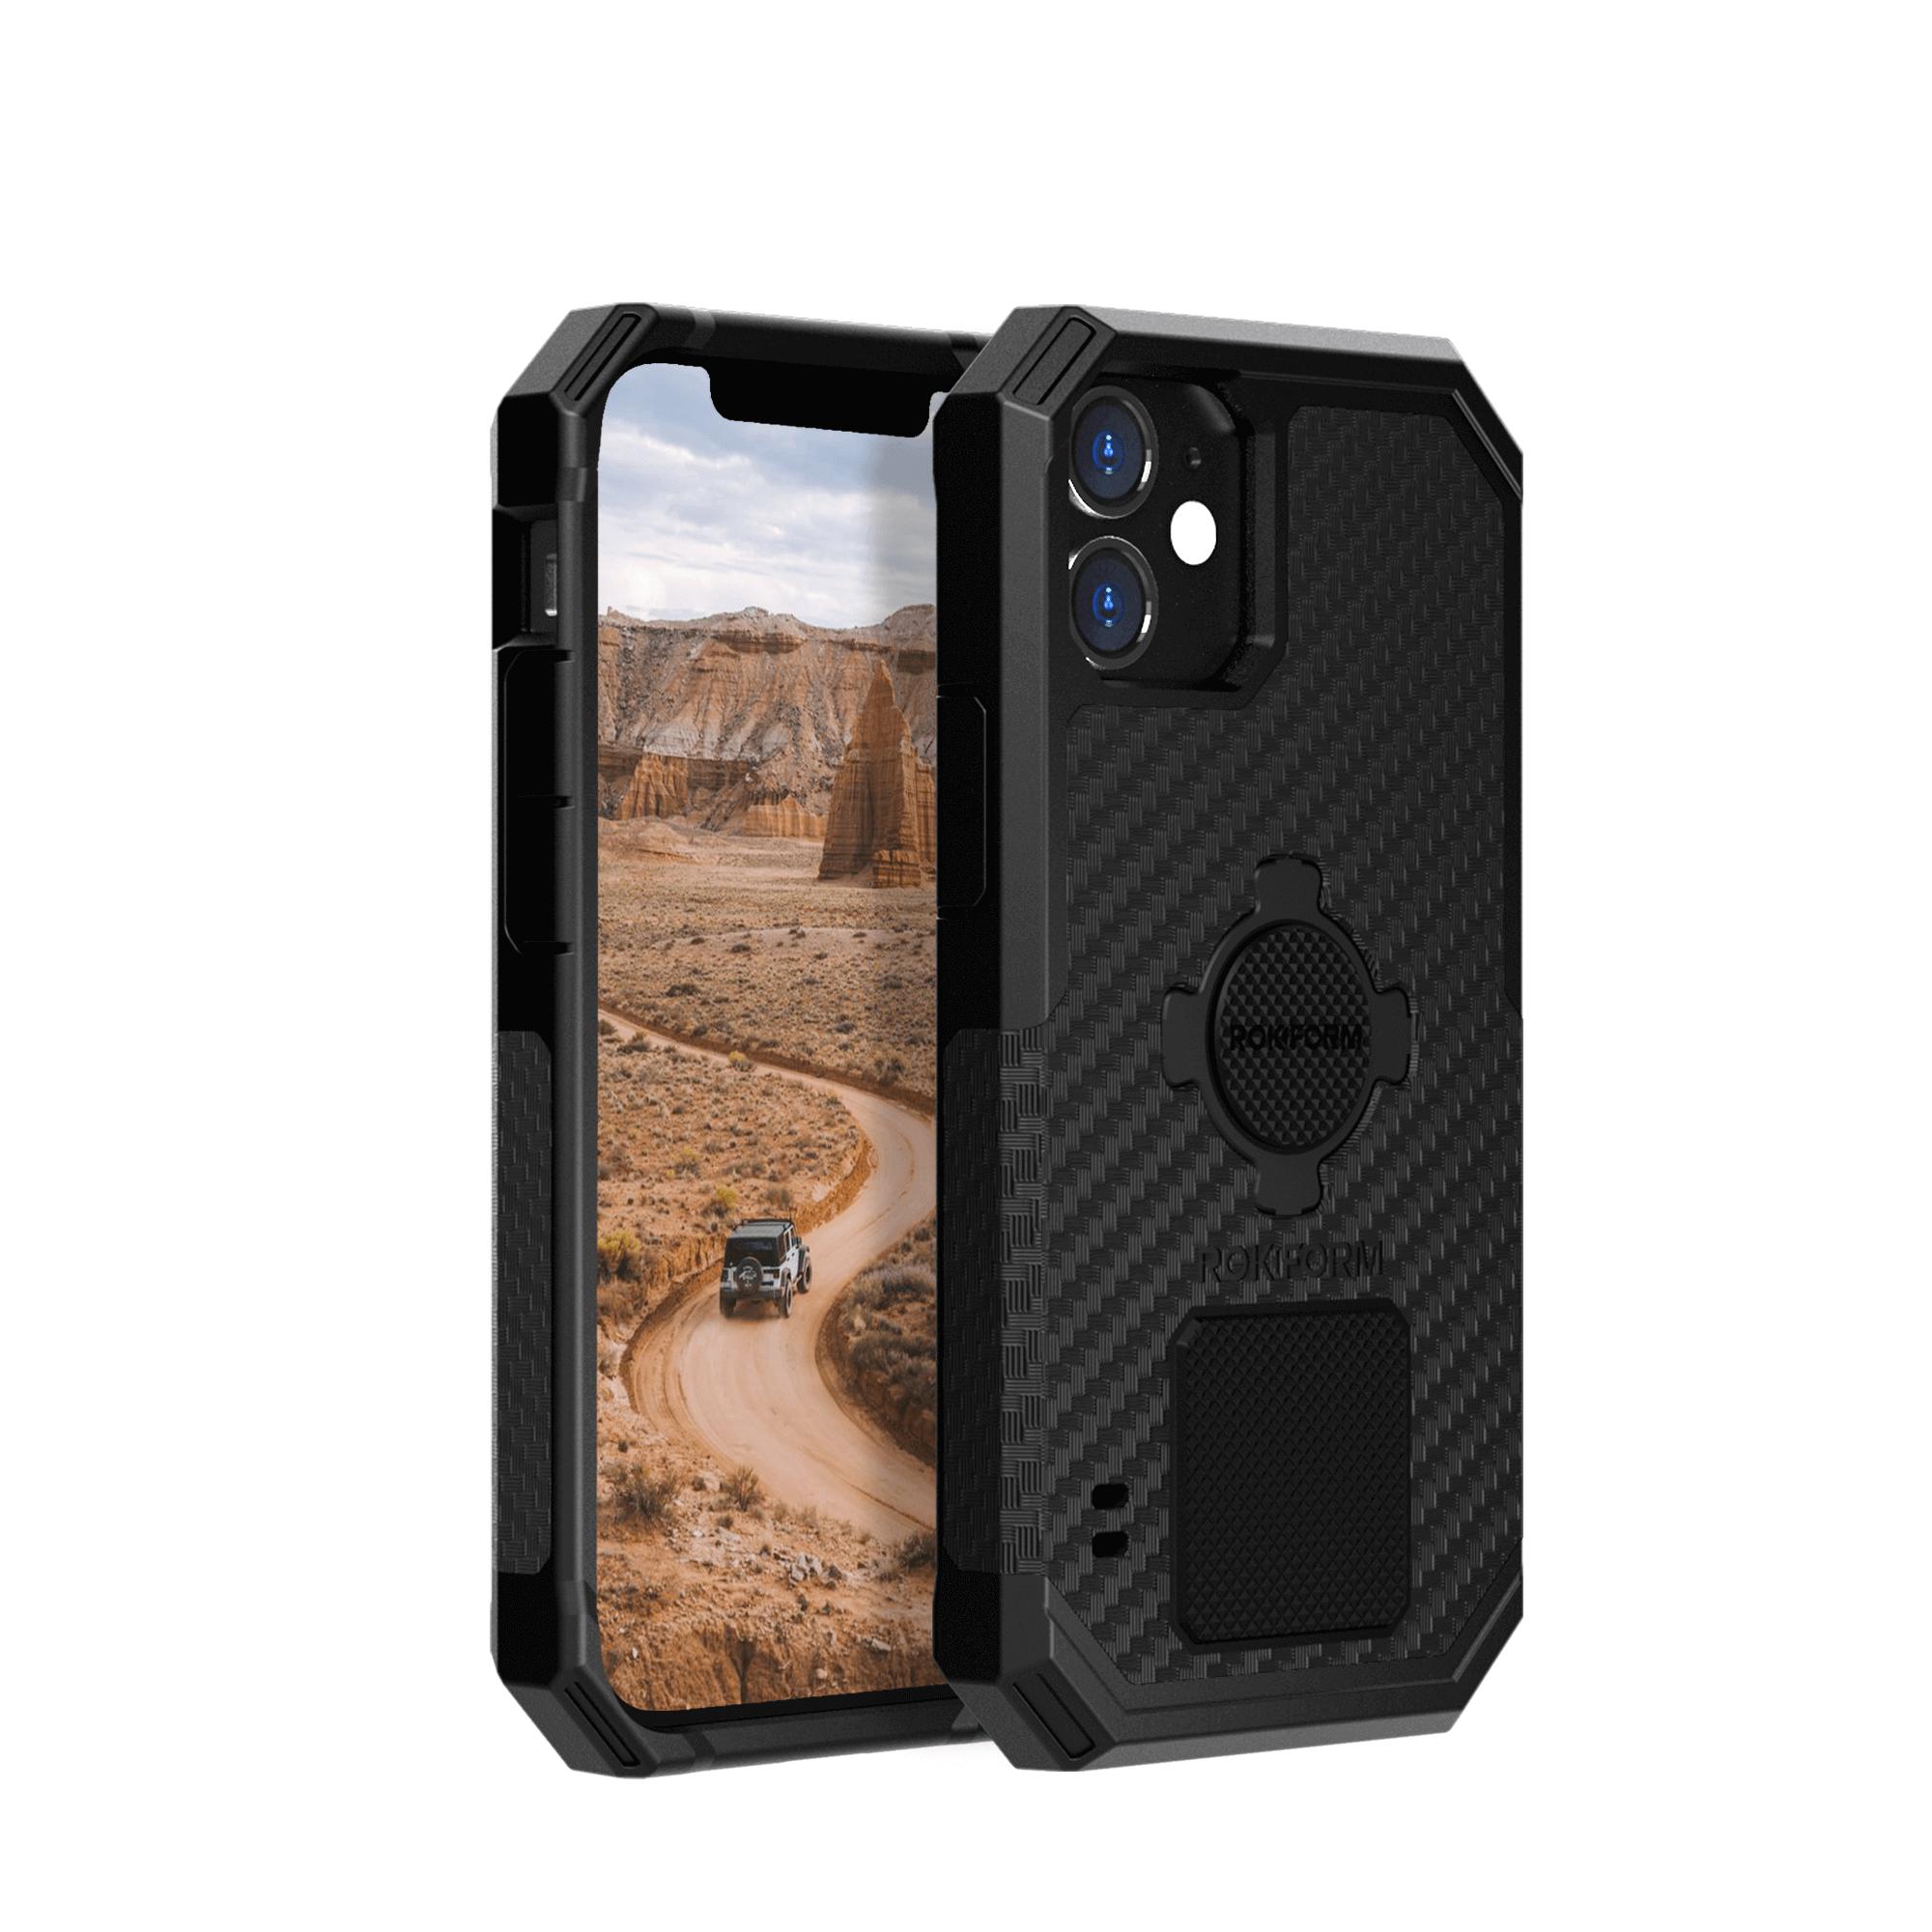 Rokform Rugged Wireless Case iPhone 12 Mini